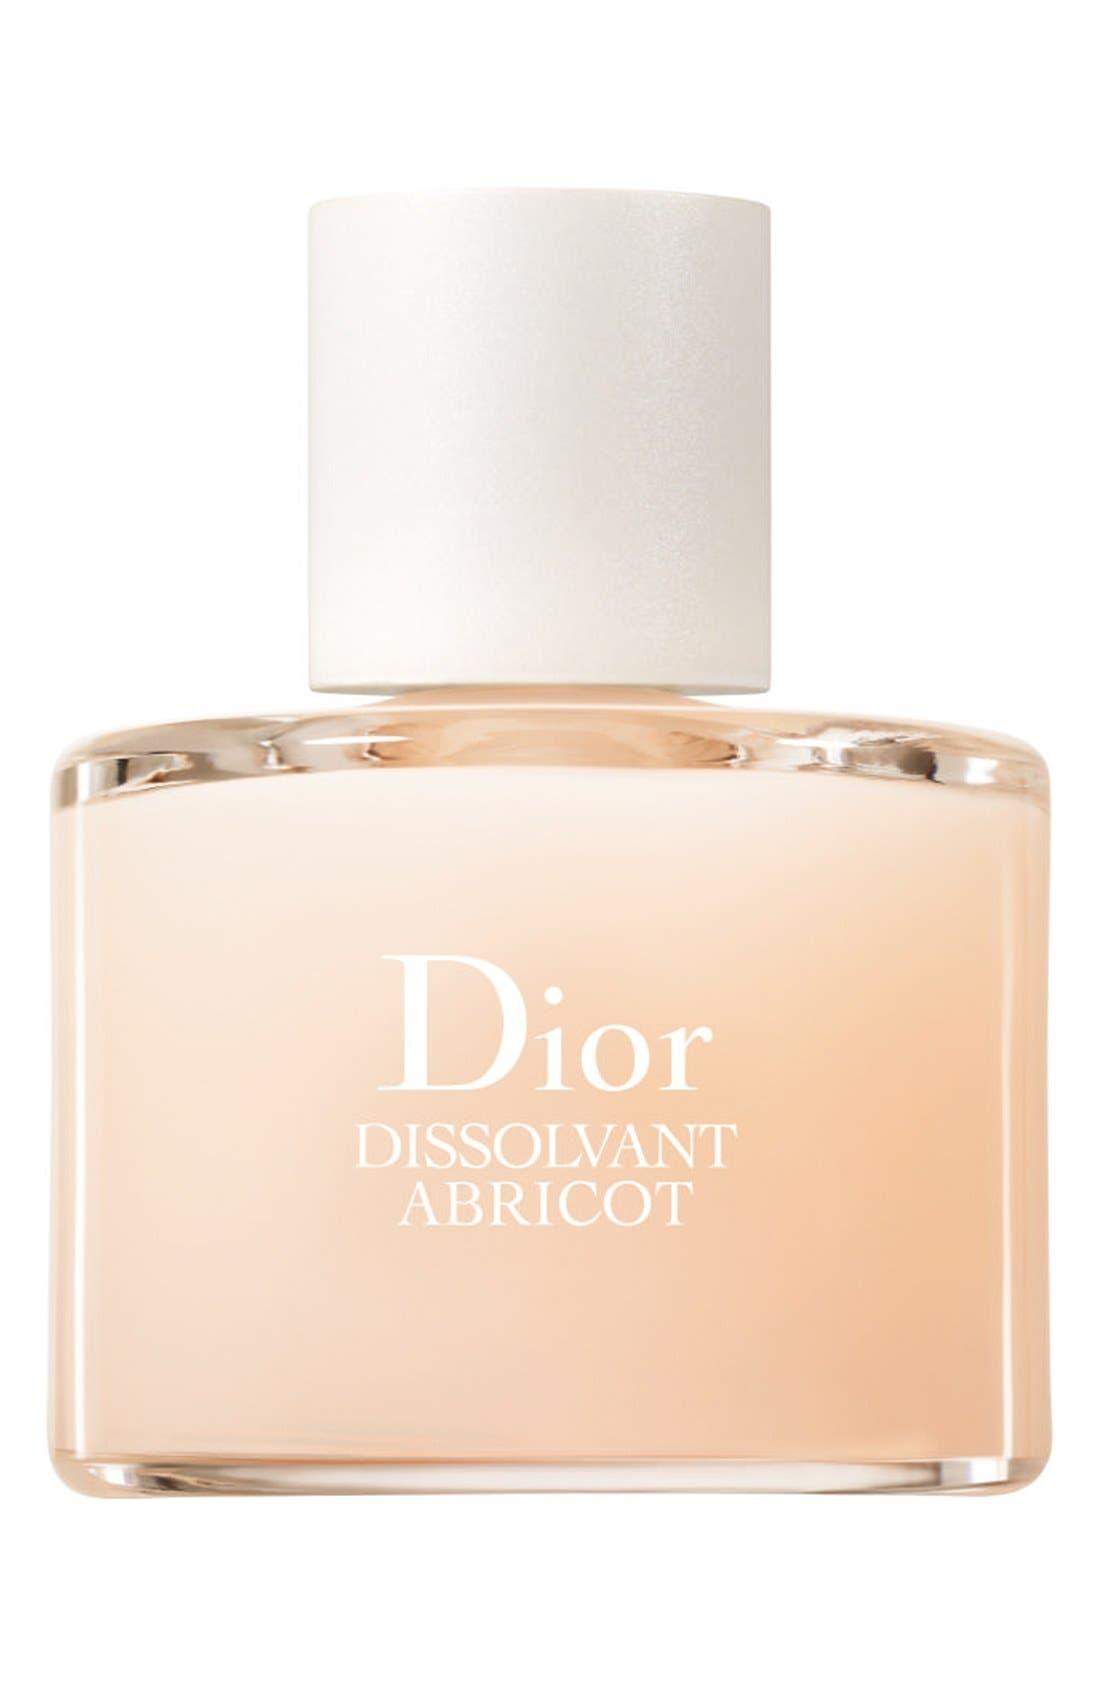 'Dissolvant Abricot' Nail Polish Remover,                             Main thumbnail 1, color,                             000